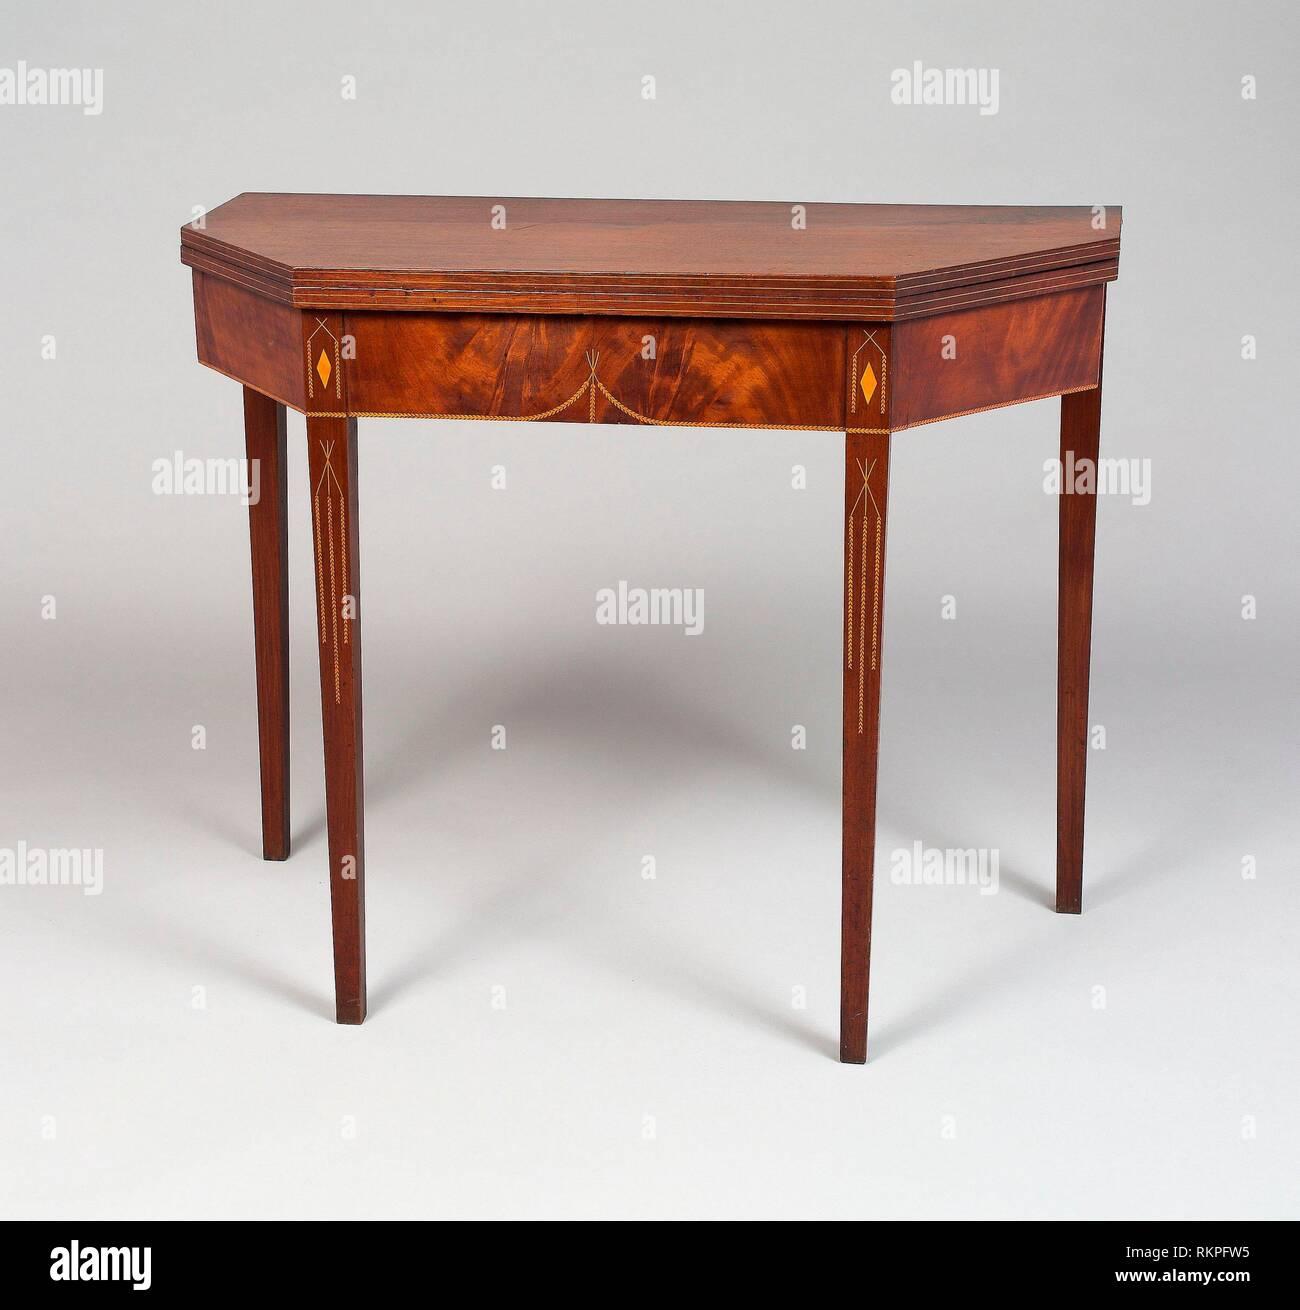 Card Table - c. 1790 - American Newport, Rhode Island - Artist: Holmes Weaver, Origin: Newport, Date: 1785–1795, Medium: Mahogany and white pine with Stock Photo